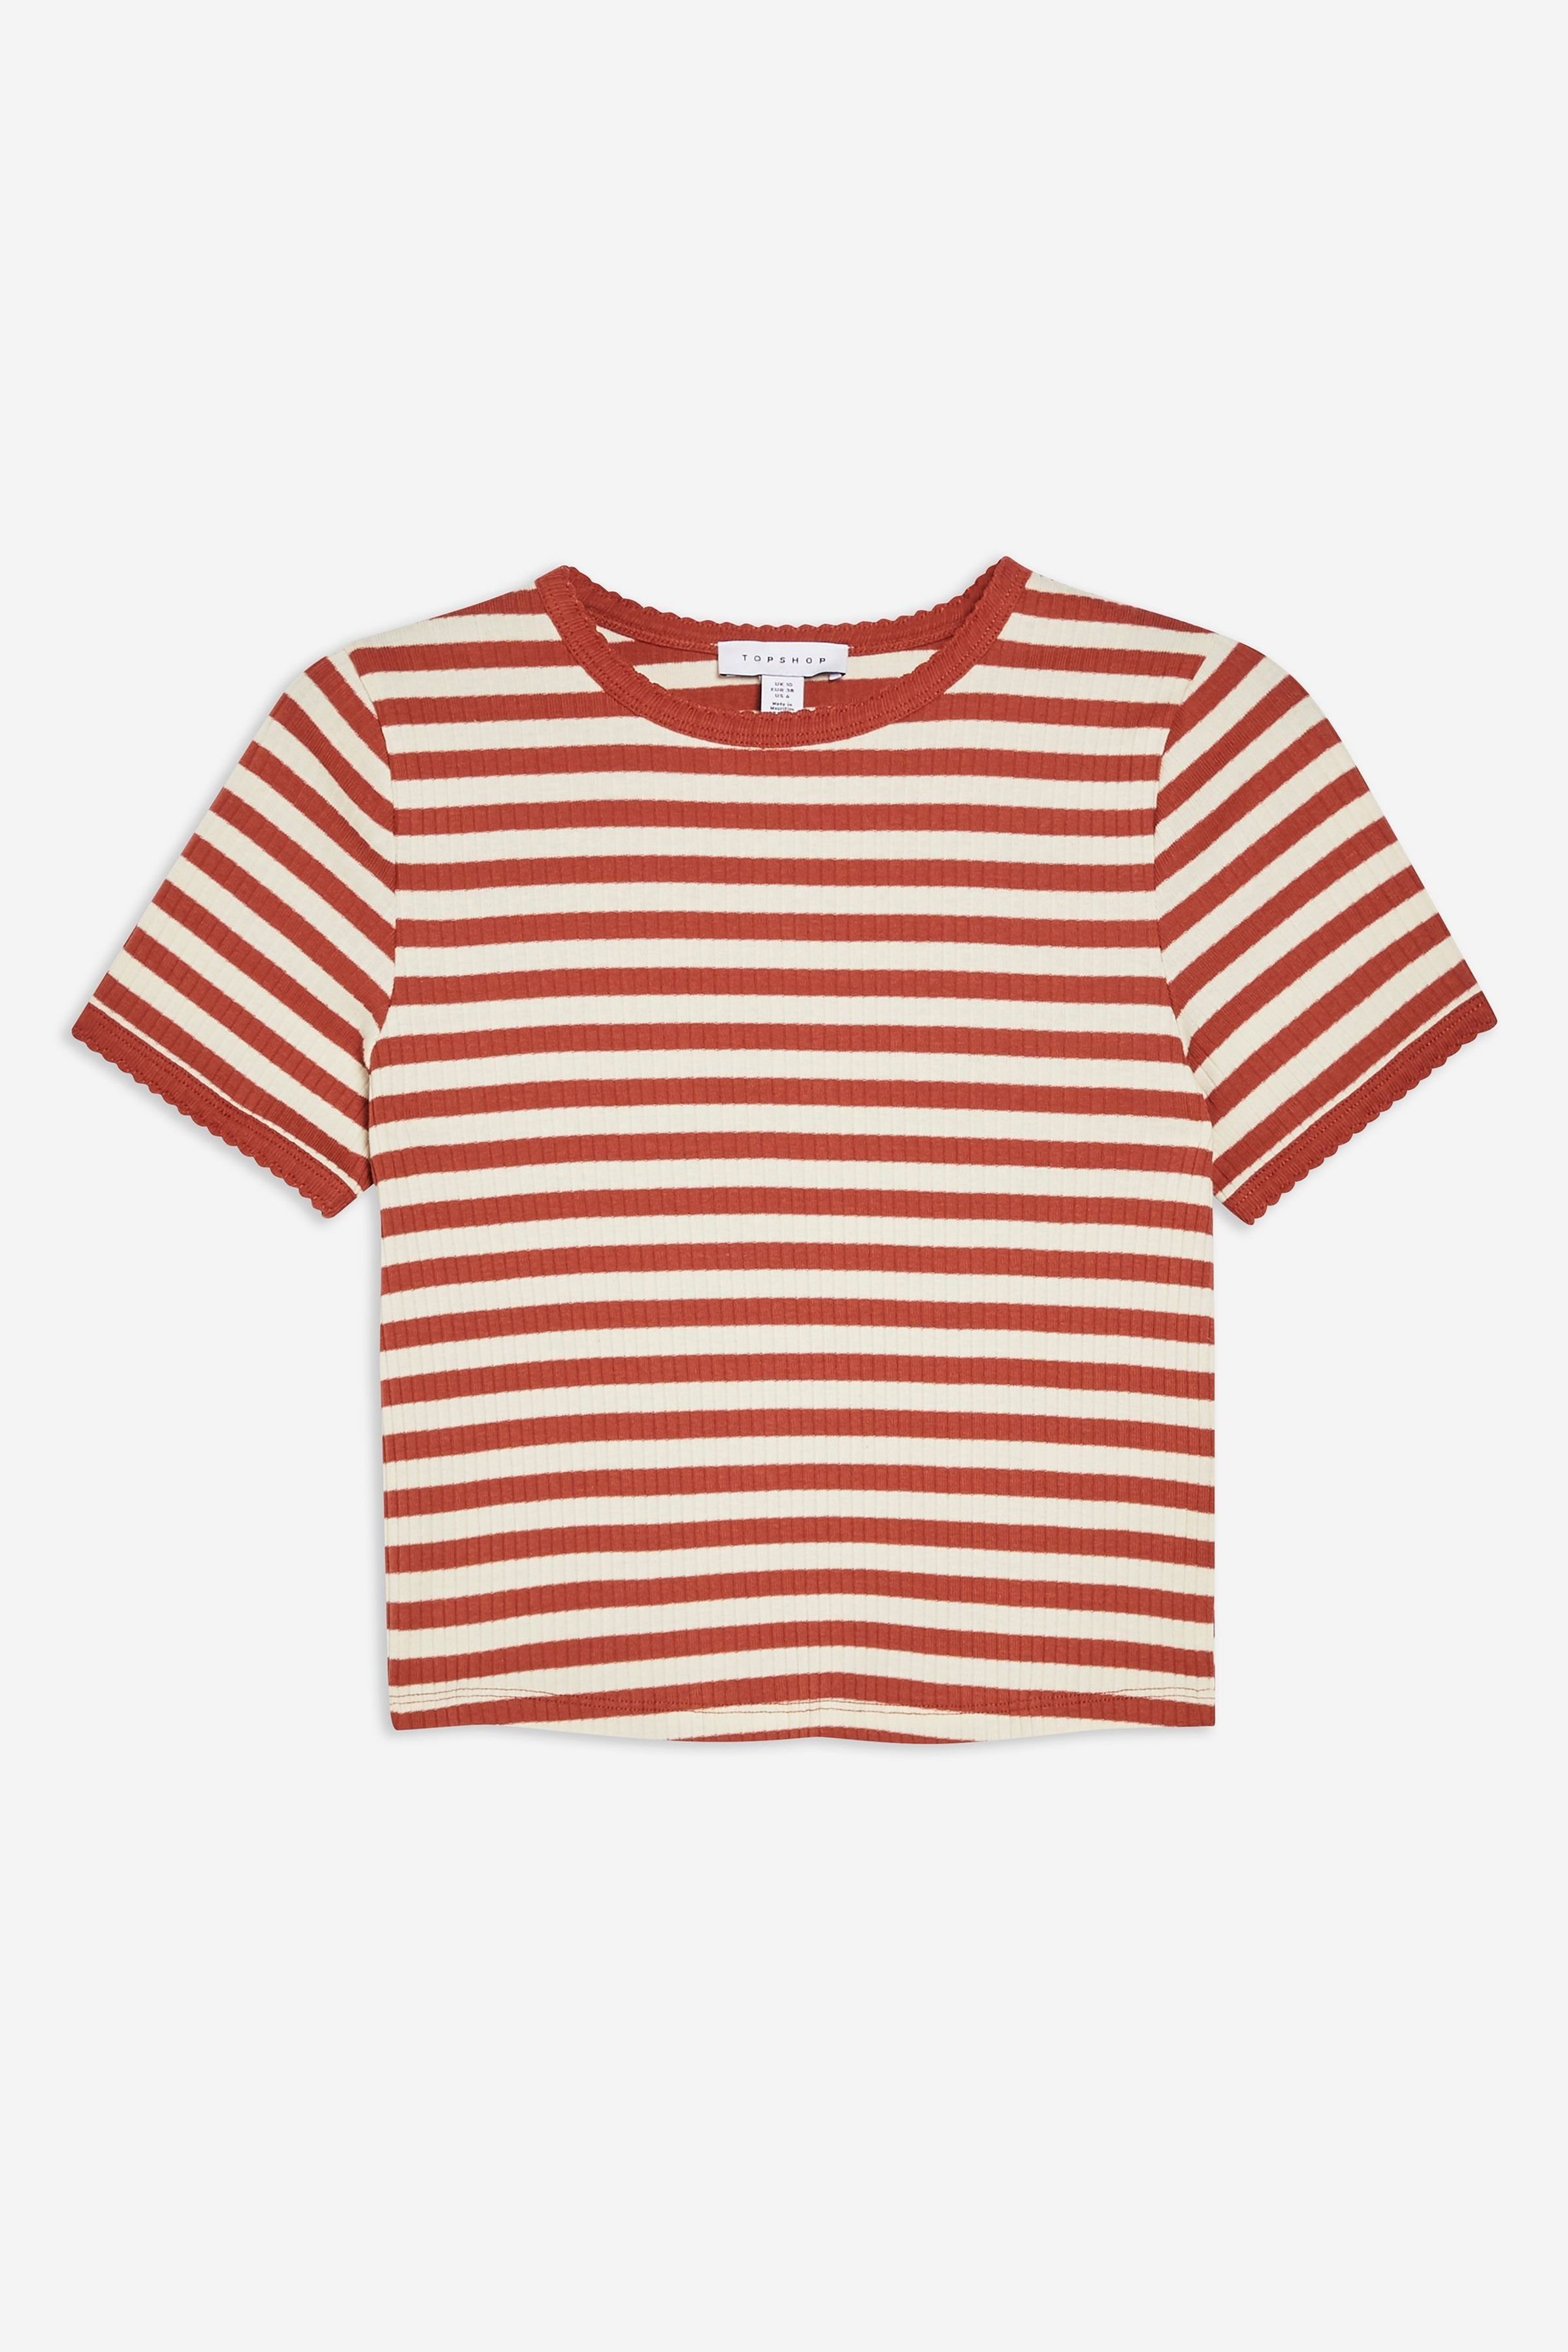 209d696d8 Carousel Image 1 Minimal Wardrobe, Shirt Outfit, T Shirt, Stripes, Topshop,